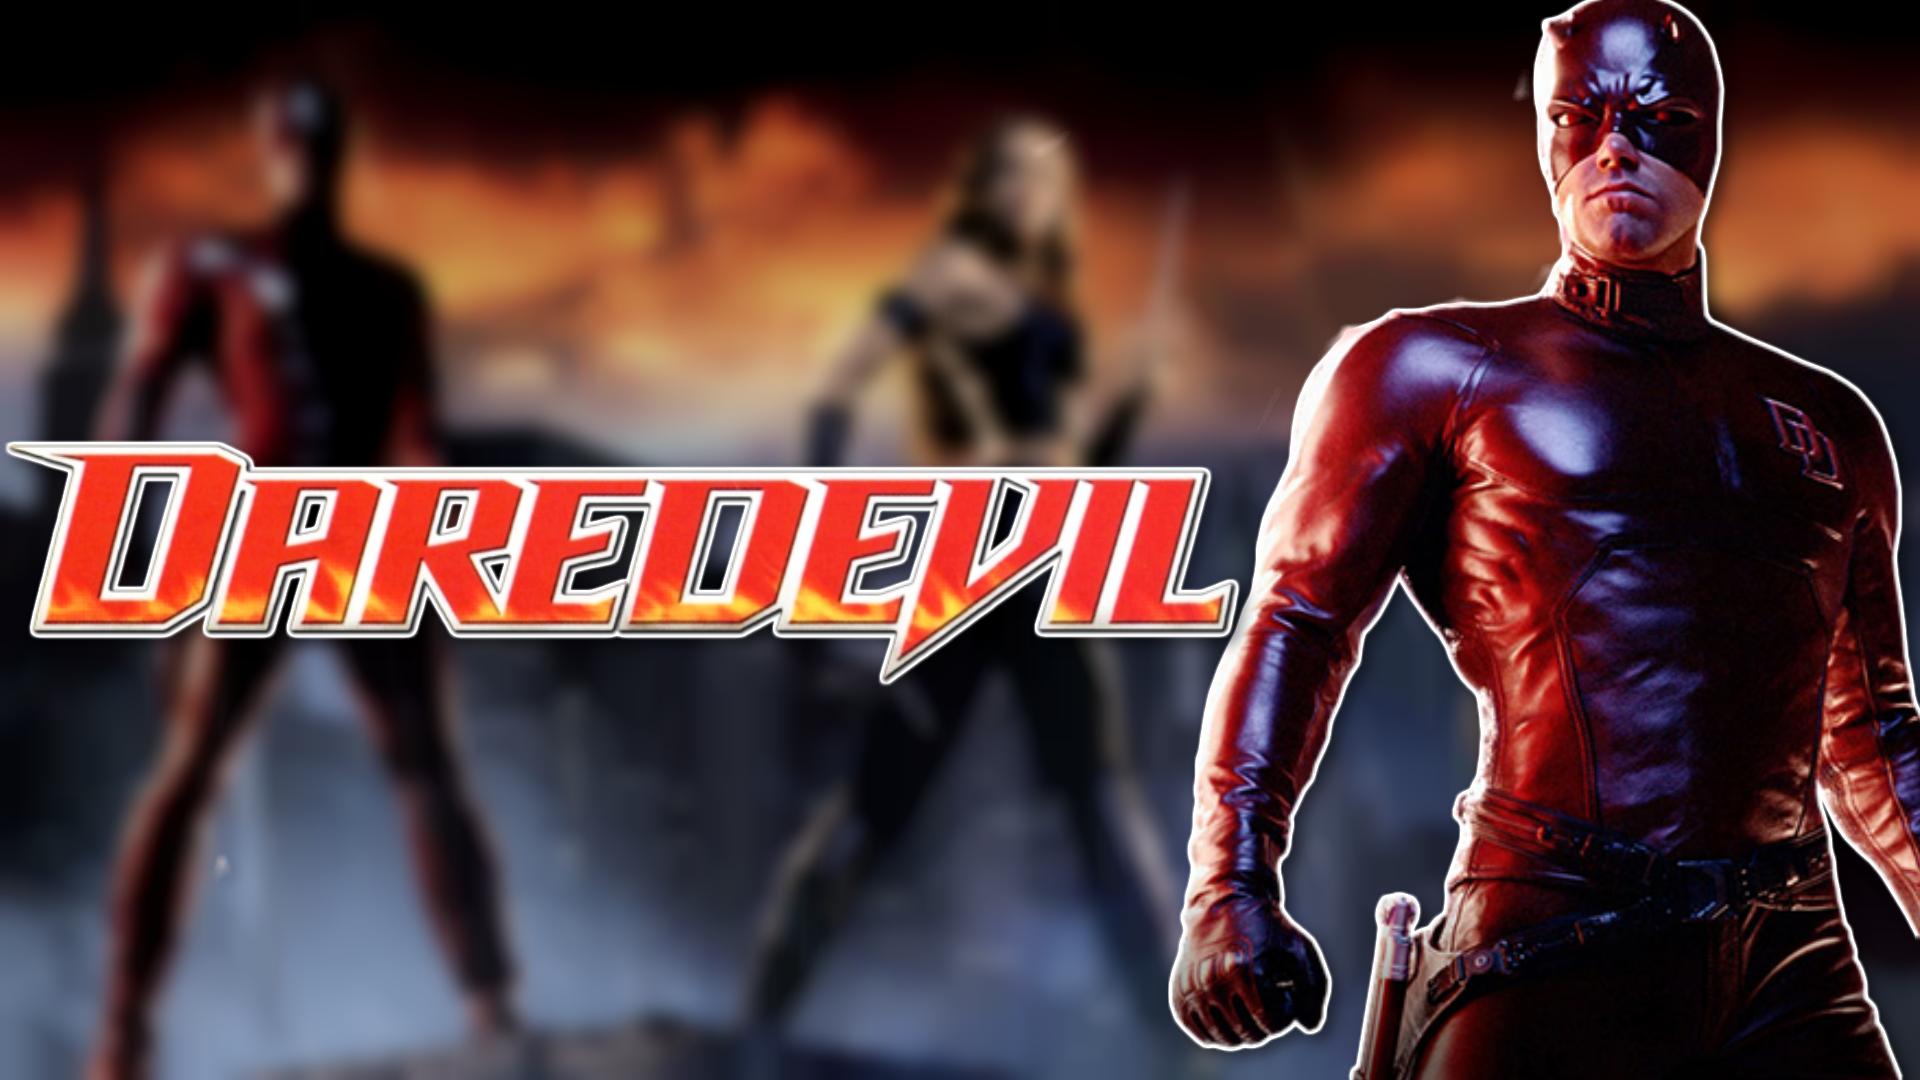 Marvel Series Daredevil 2003 Wallpaper By 1080wallpapers On Deviantart